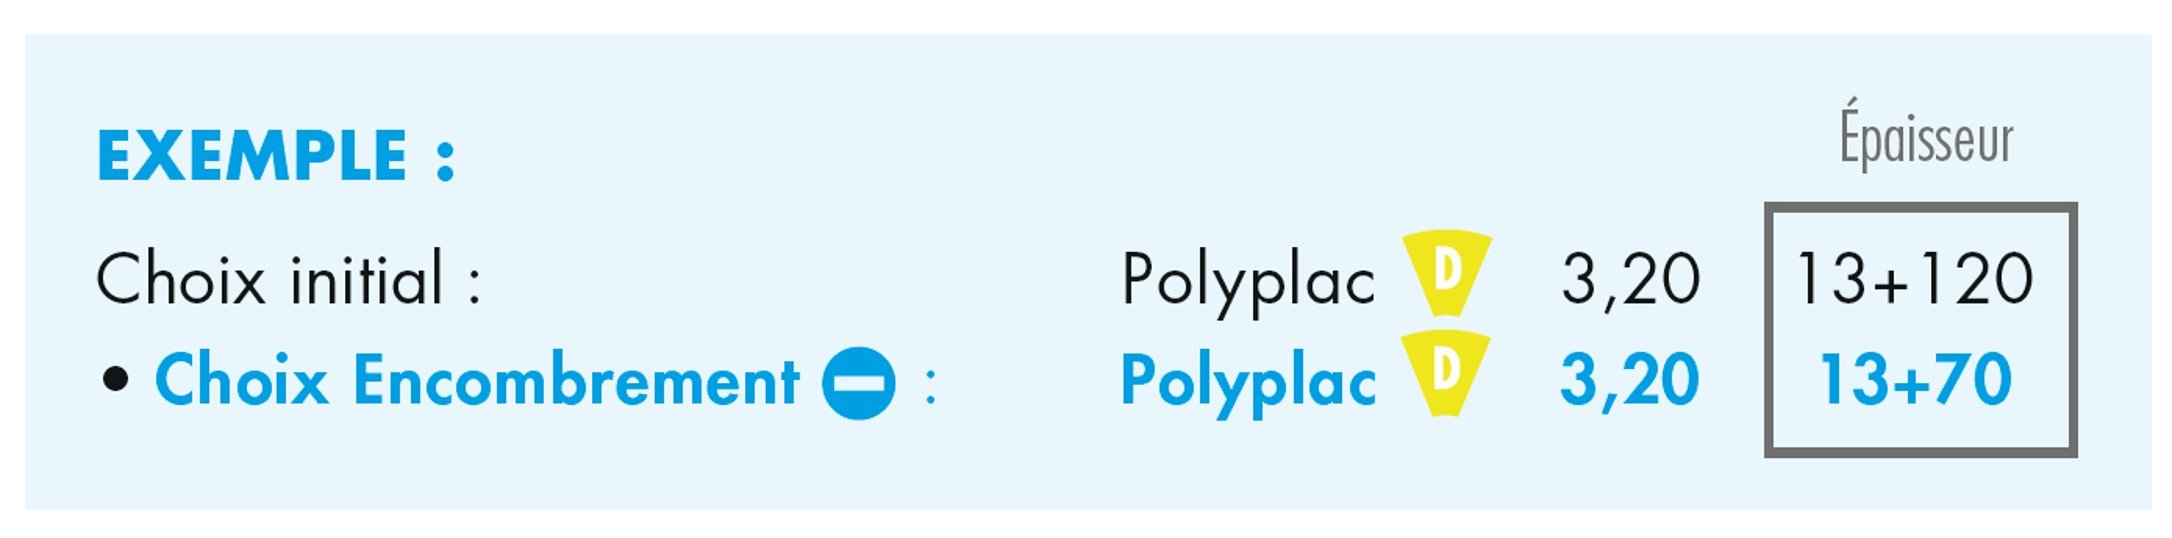 Polyplac_consommation-énergie3